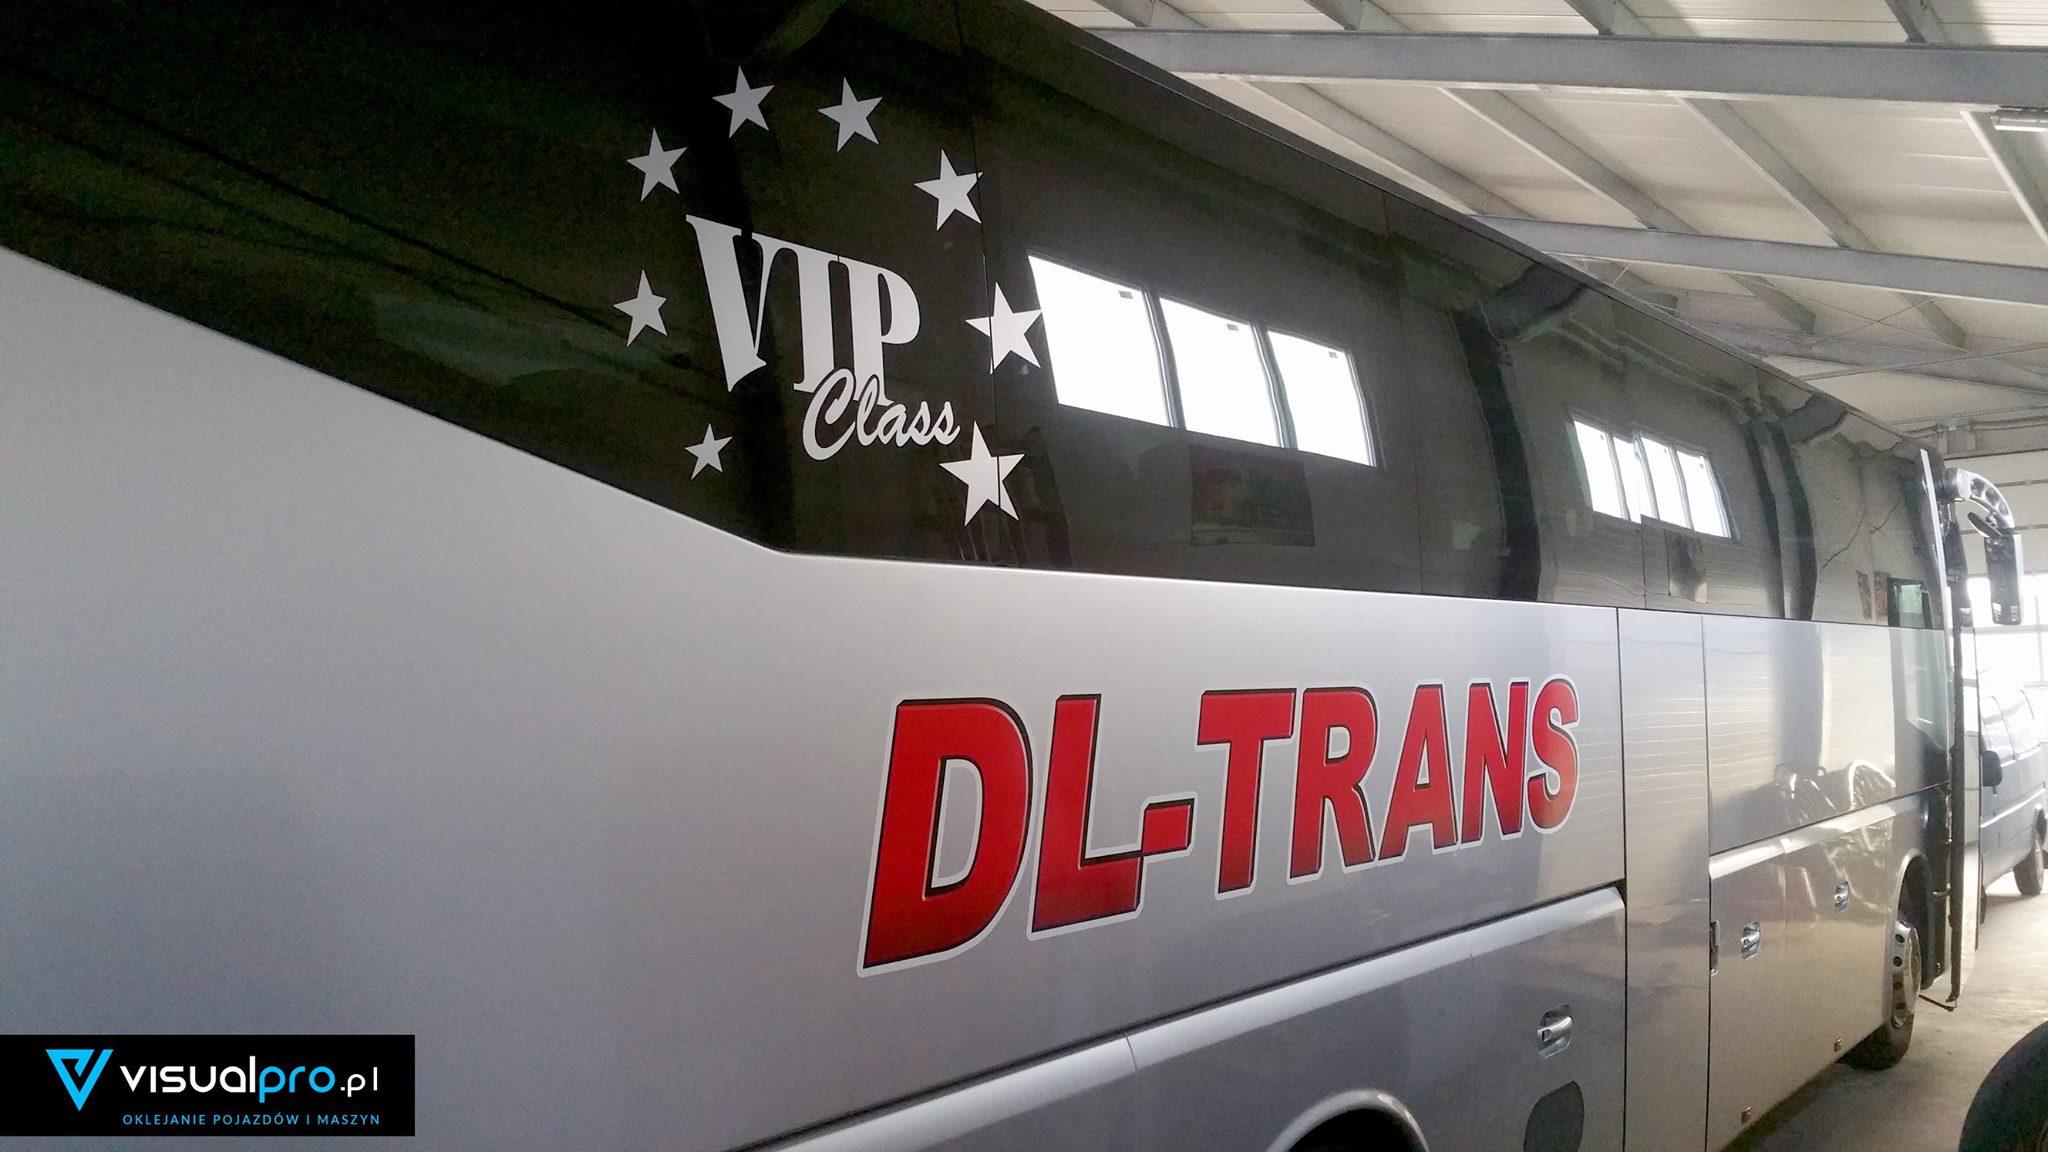 Obrandowanie Autokaru DL TRANS